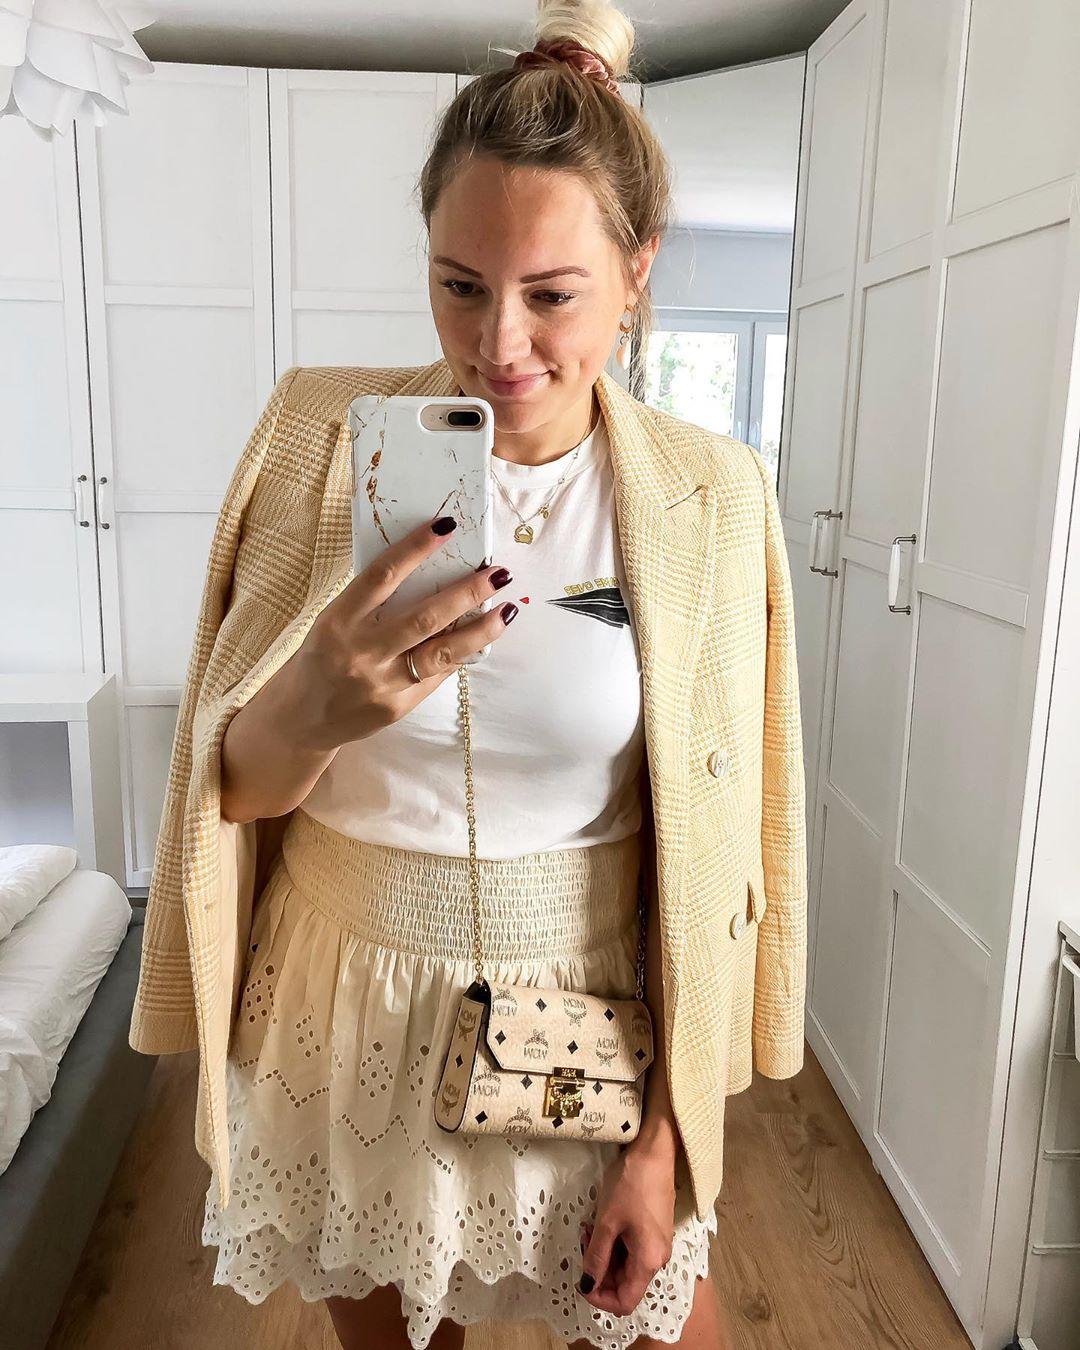 perforated embroidery skirt de Zara sur iraundbellchen